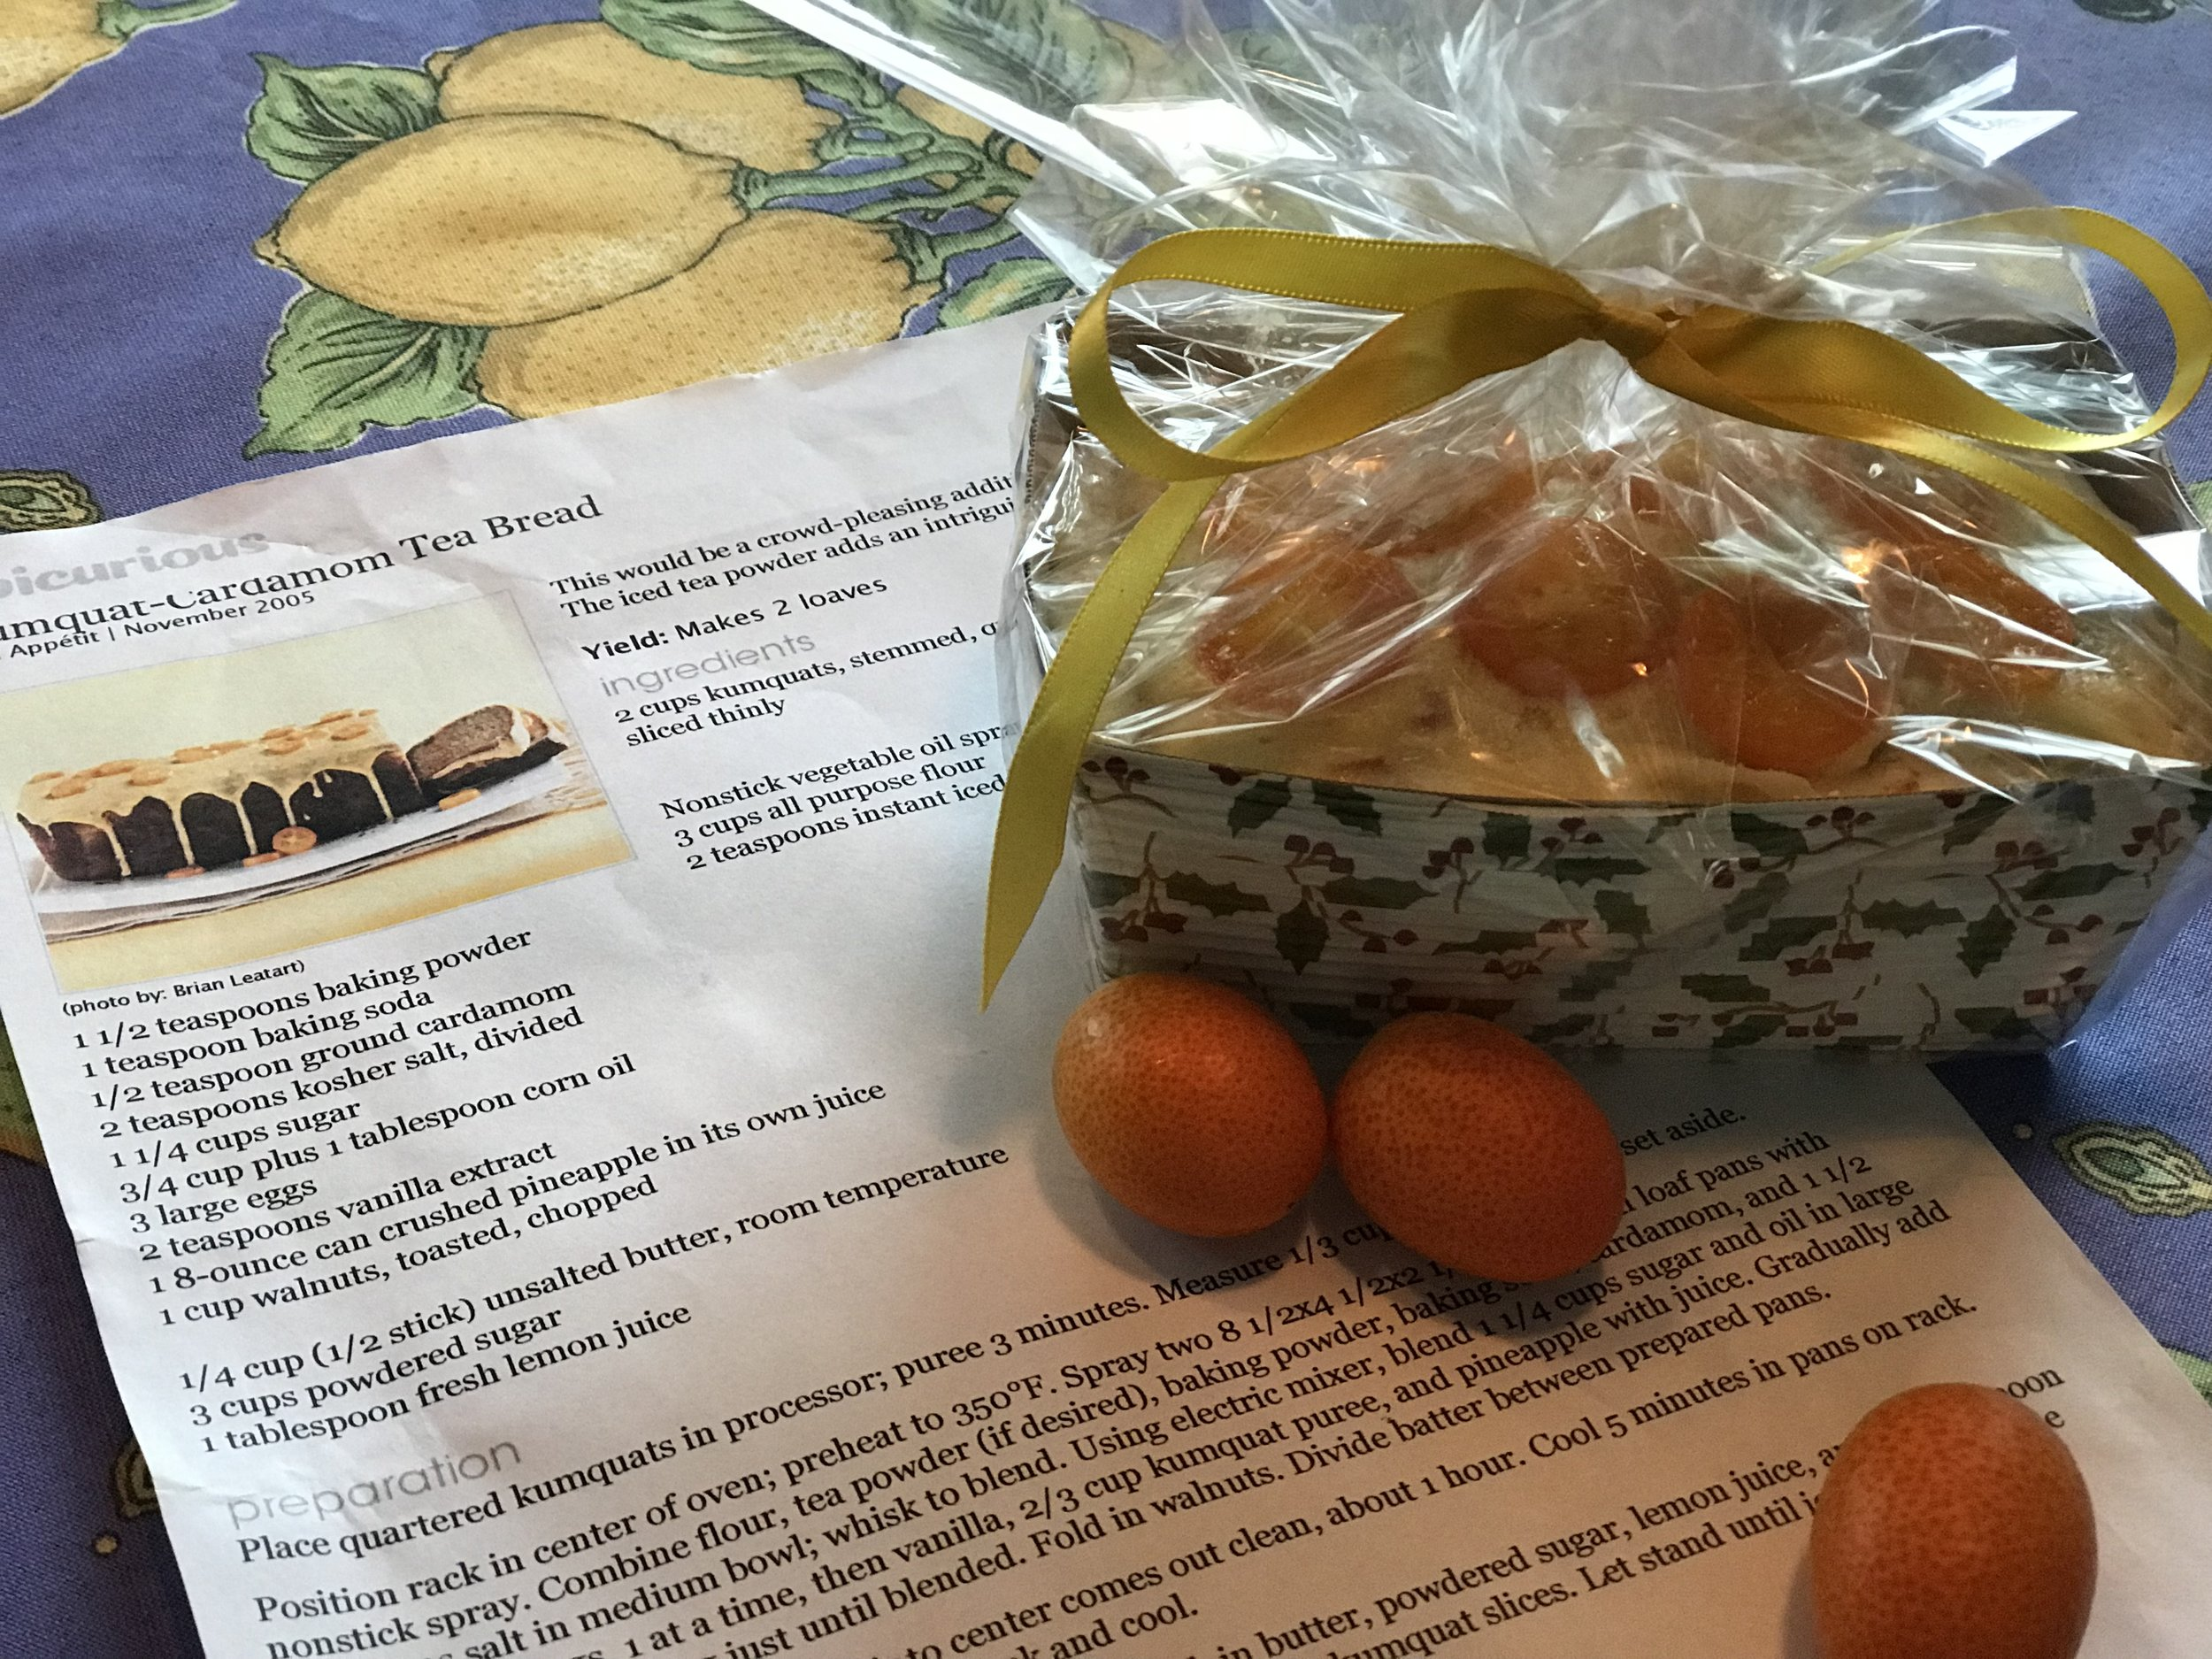 Kumquat-Cardamon Tea Bread, Perfect for a Gift